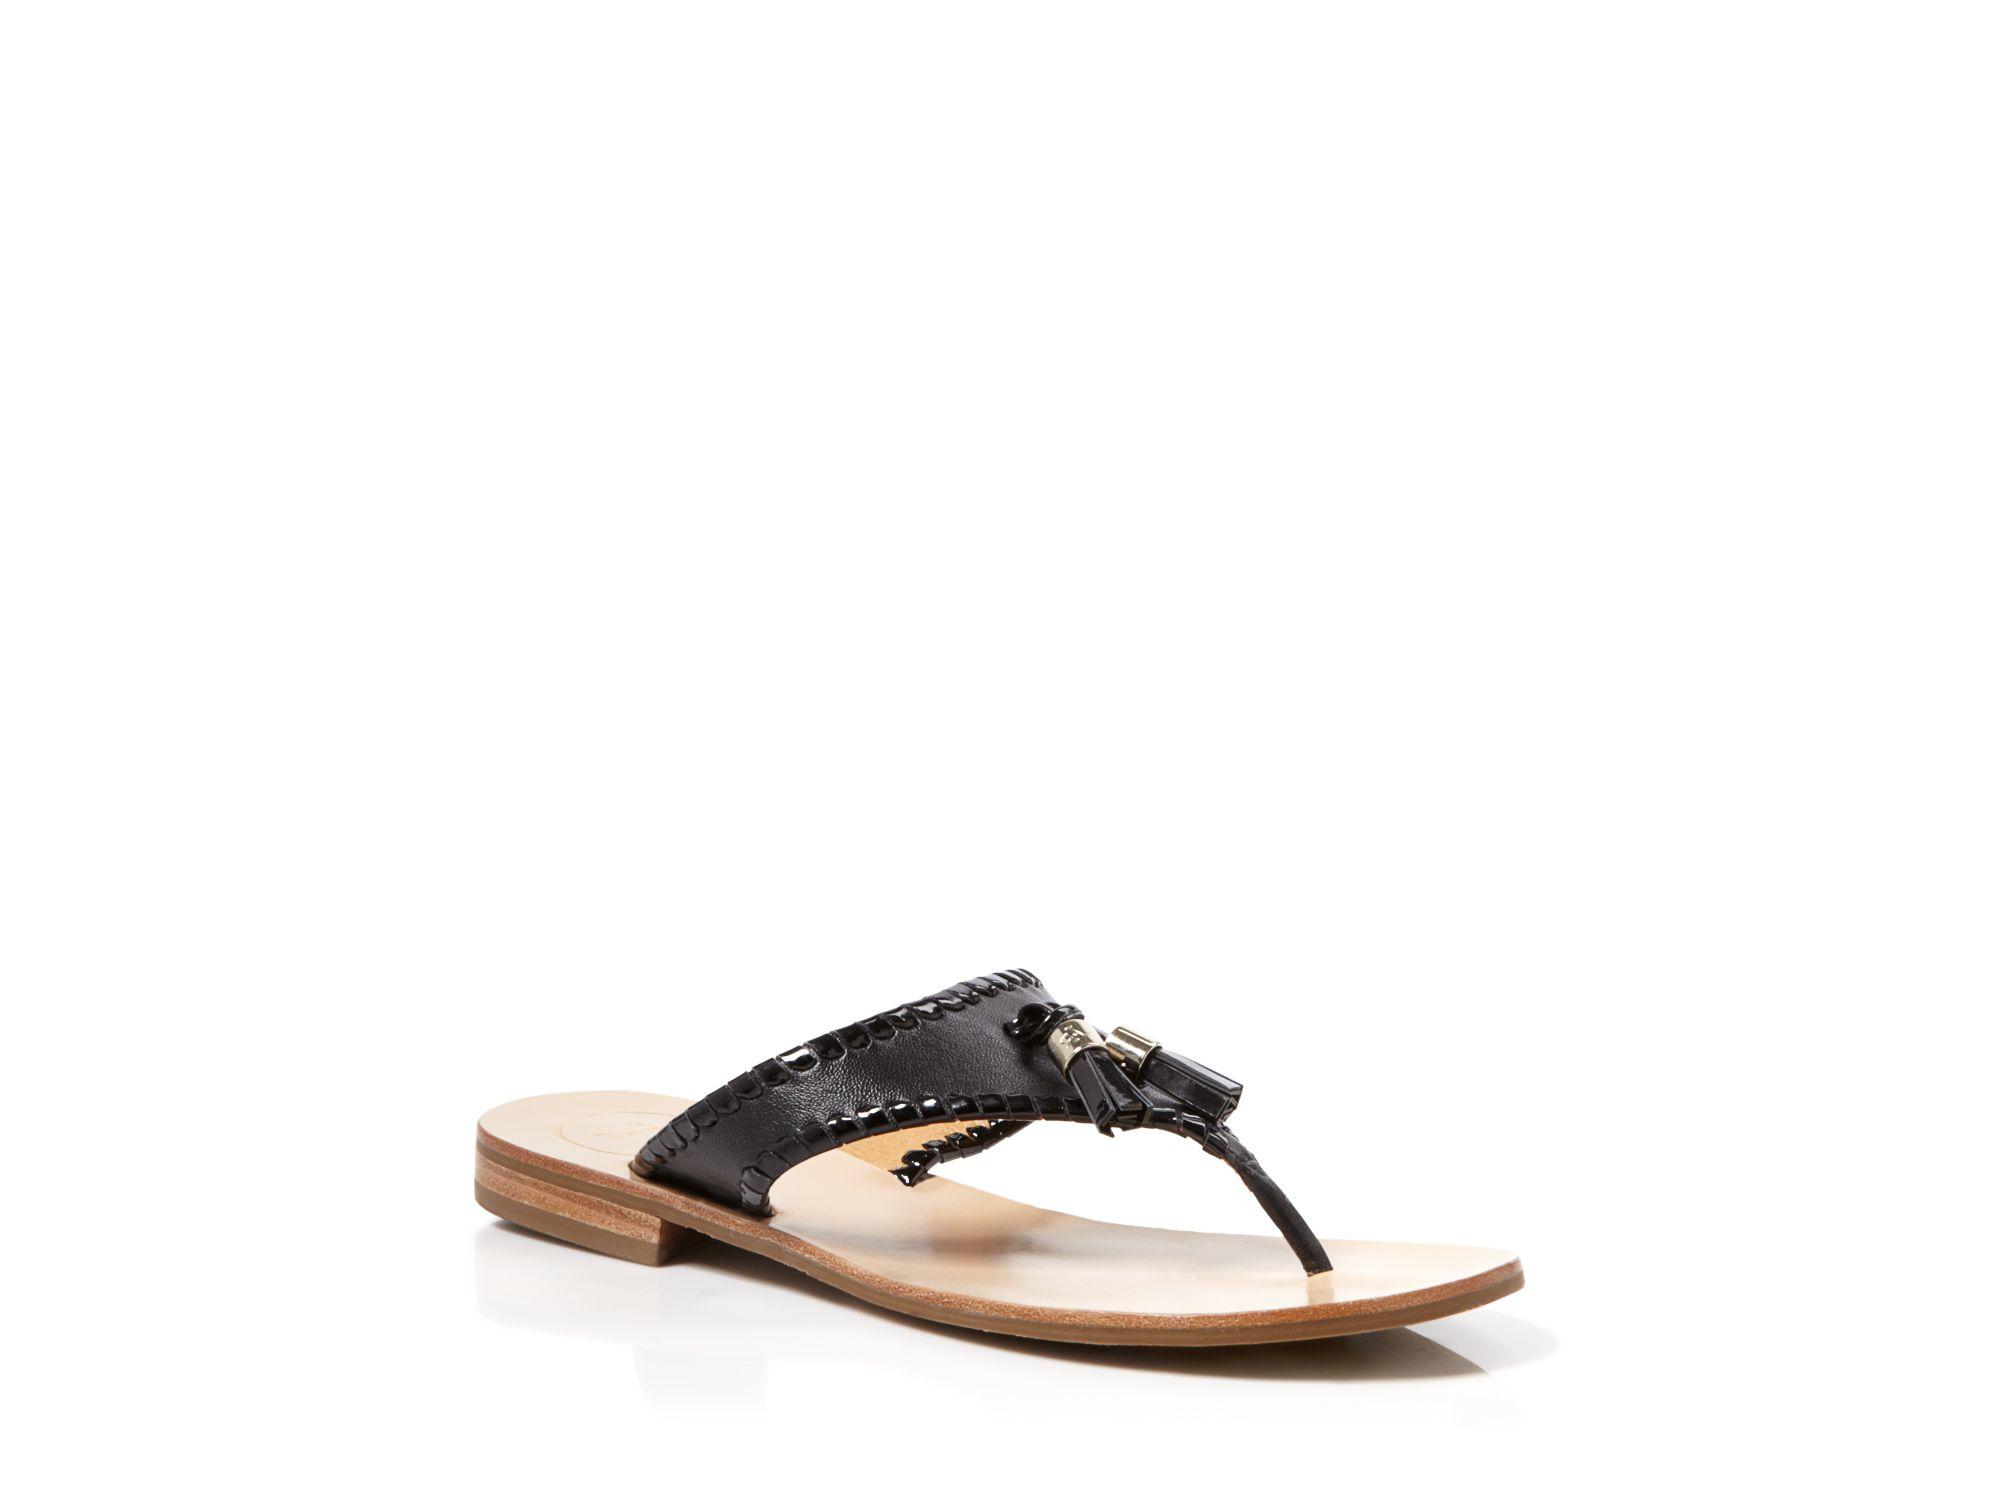 580c66ba1 Lyst - Jack Rogers Flat Thong Sandals - Alana Tassel in Black